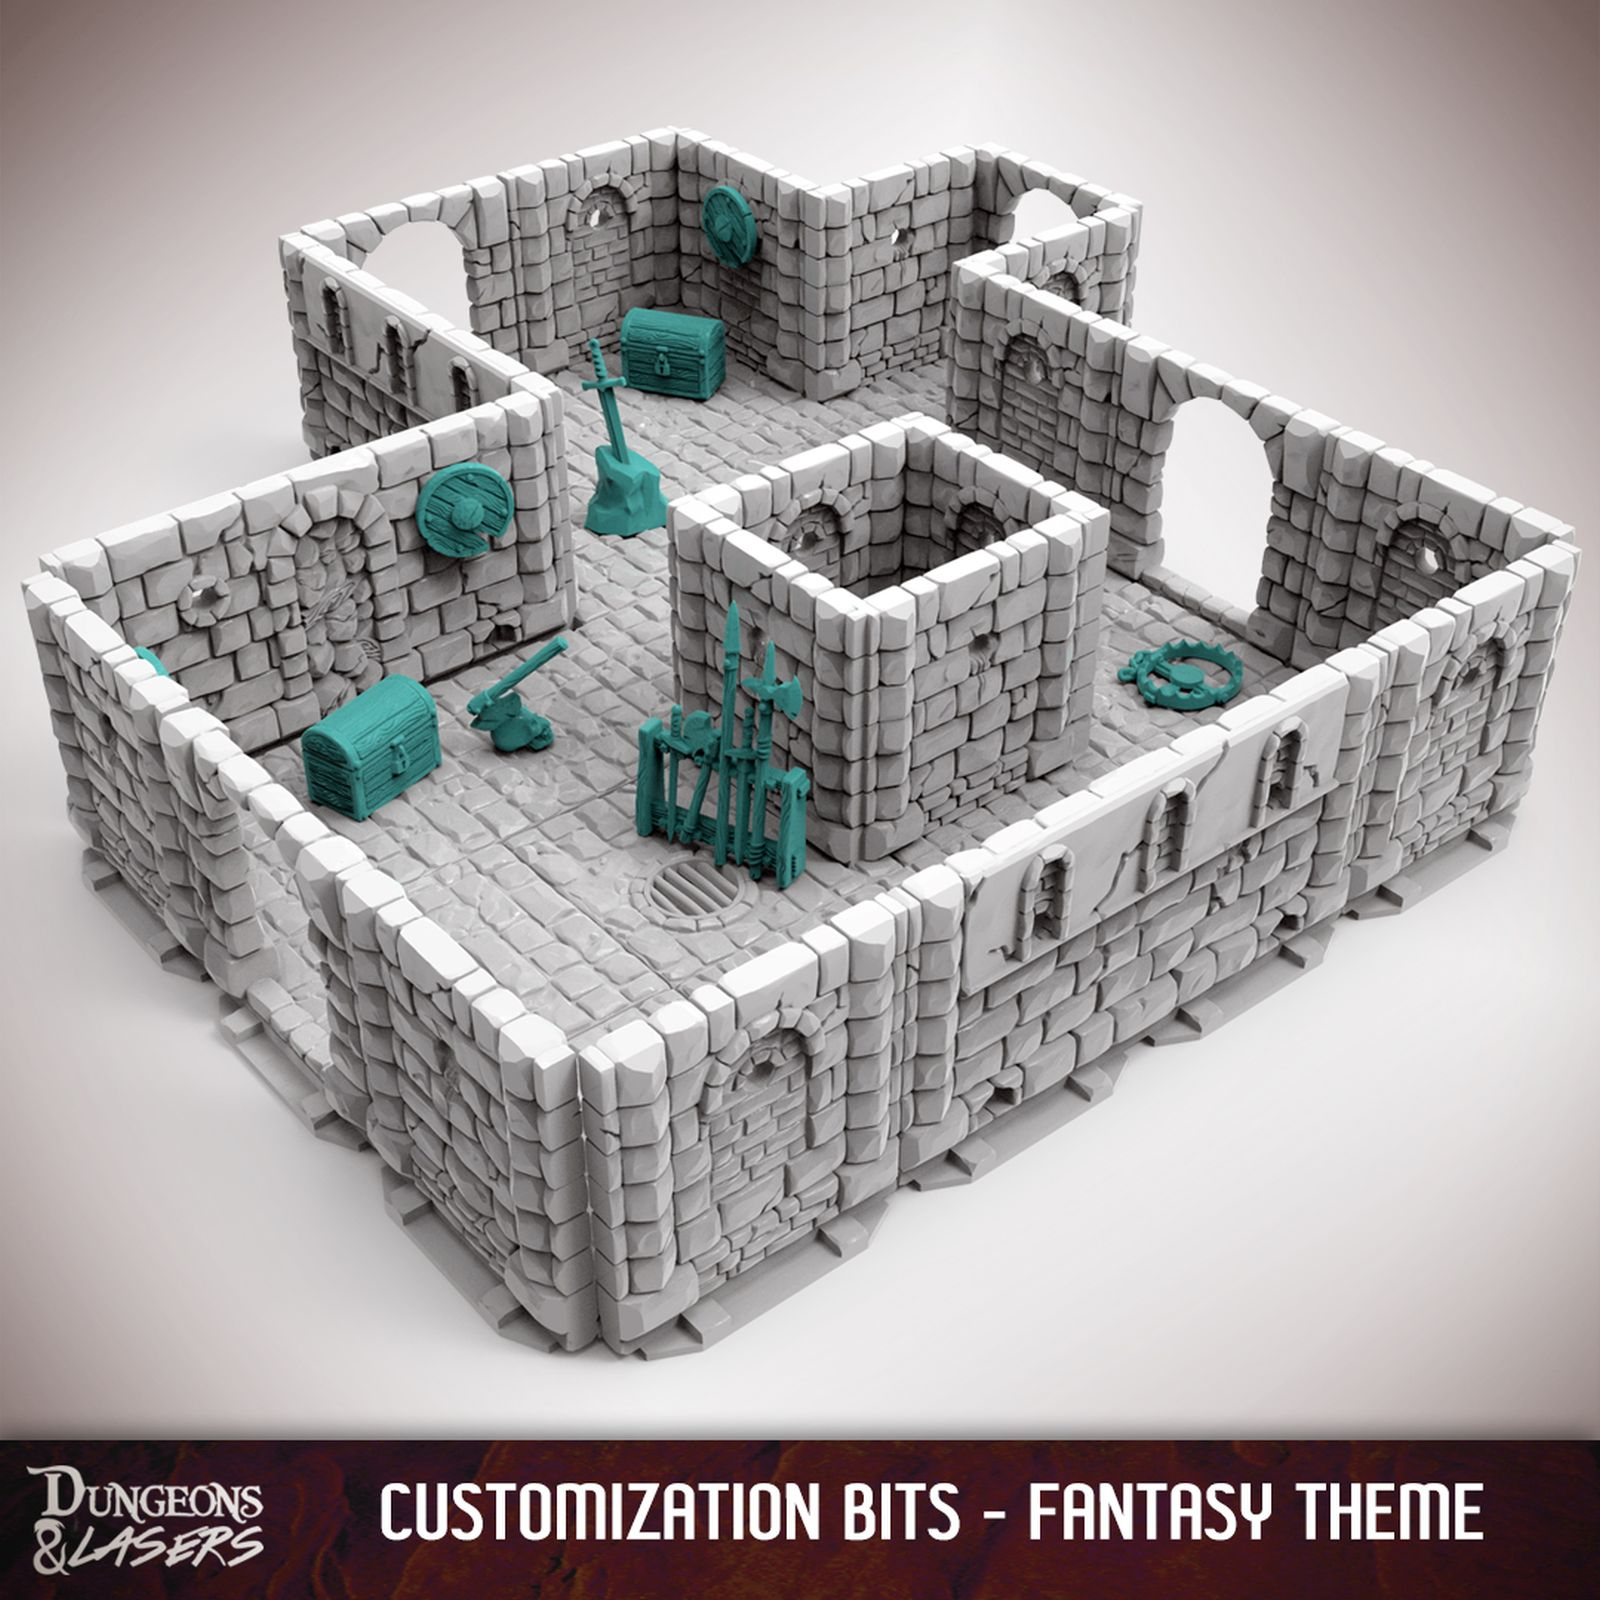 D&L - 1x1 - customization fantasy.jpg